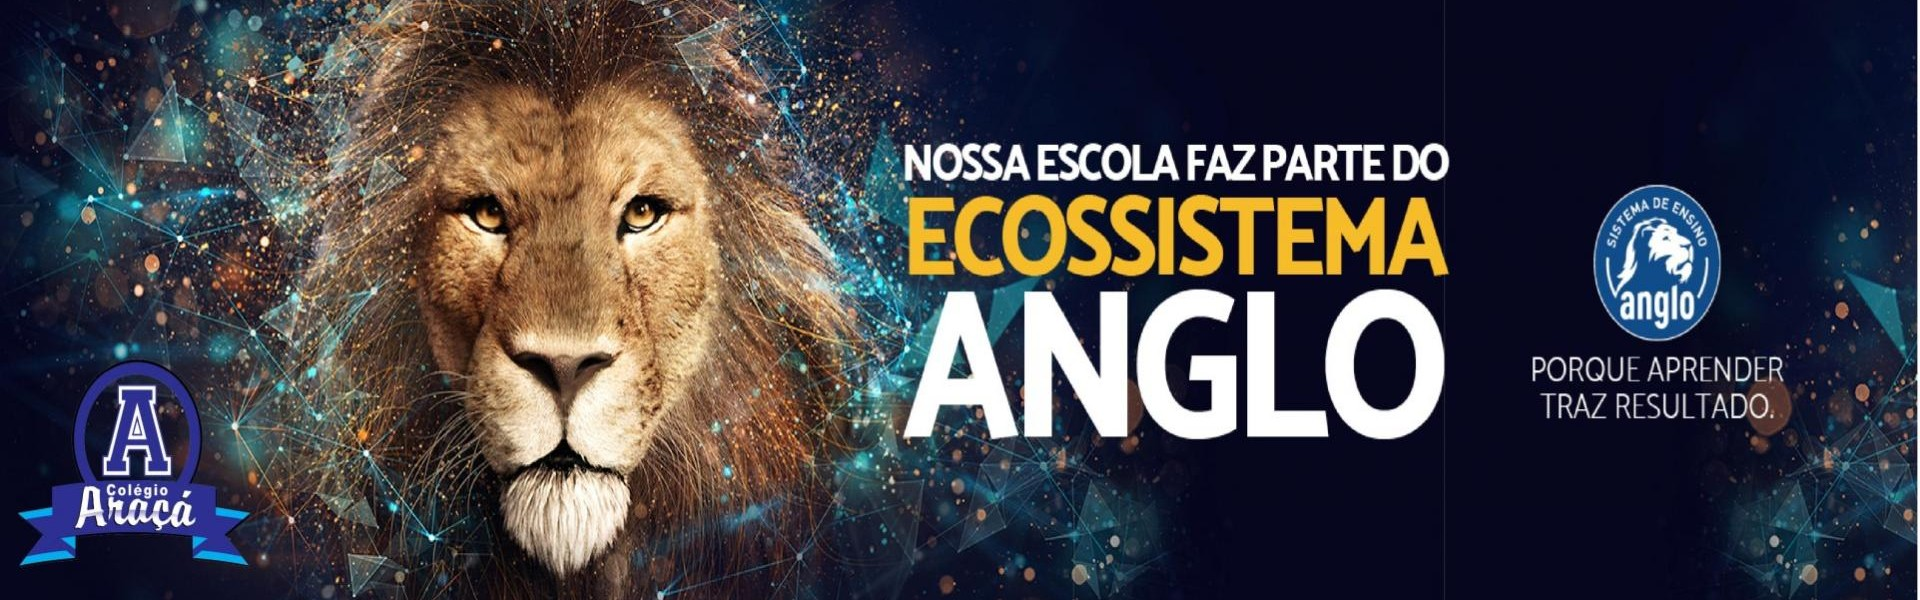 Ecossitema Anglo